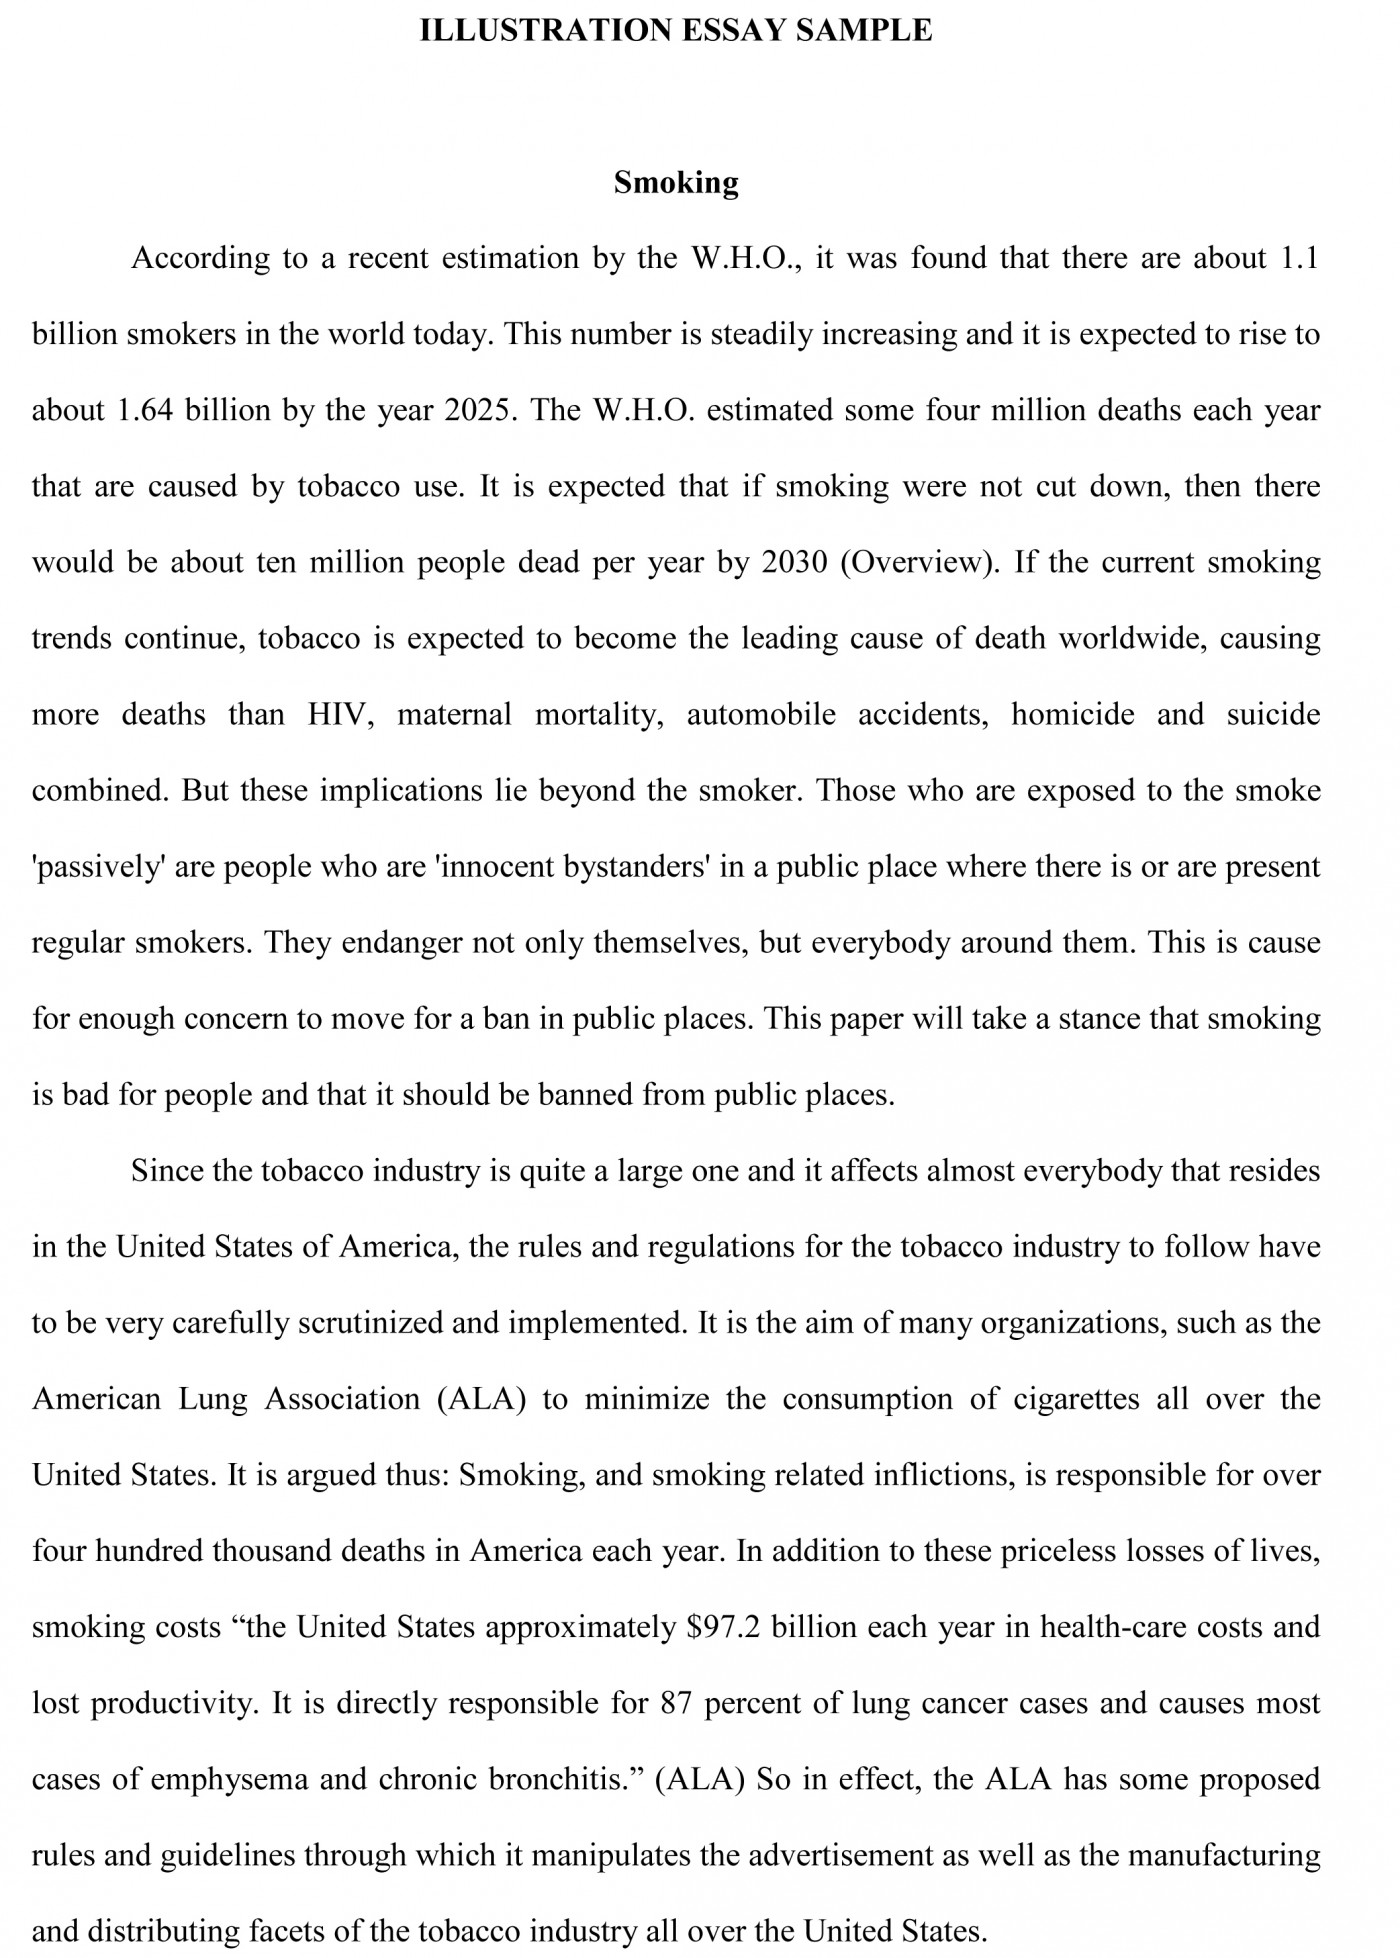 essay example examples of illustration sample  thatsnotus